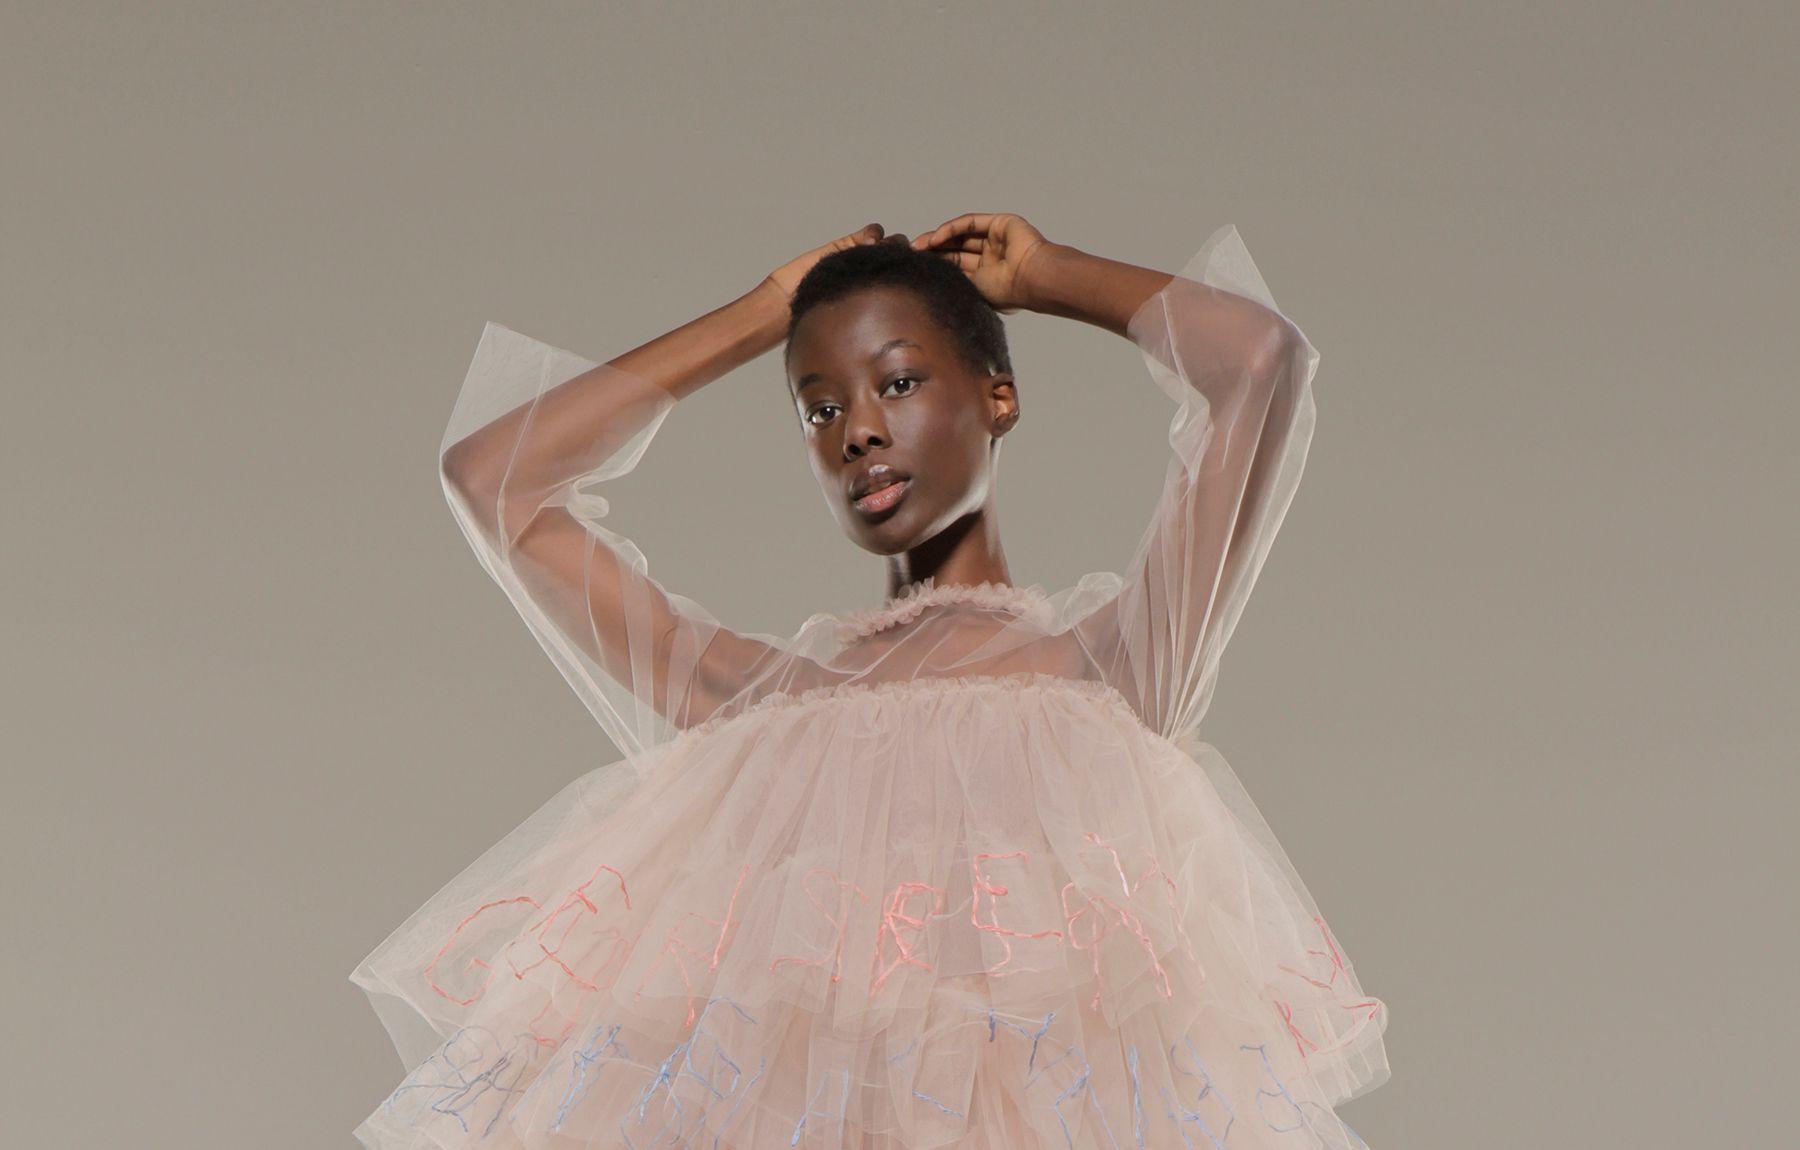 Georgia Panagiotou, BA (Hons) Fashion Design, UCA Rochester